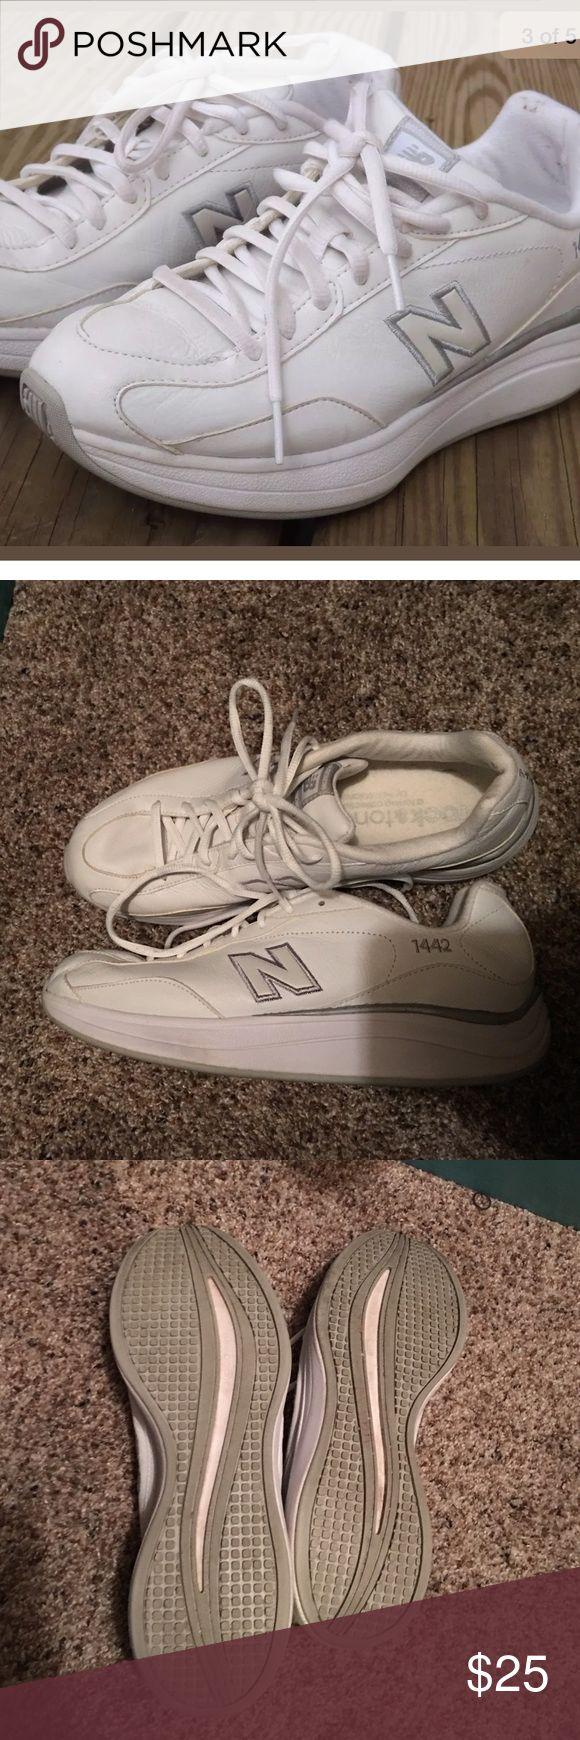 New Balance 1442 Rock & Tone Leather Walking Shoe EUC, plenty of life left and perfect for walking! New Balance Shoes Athletic Shoes